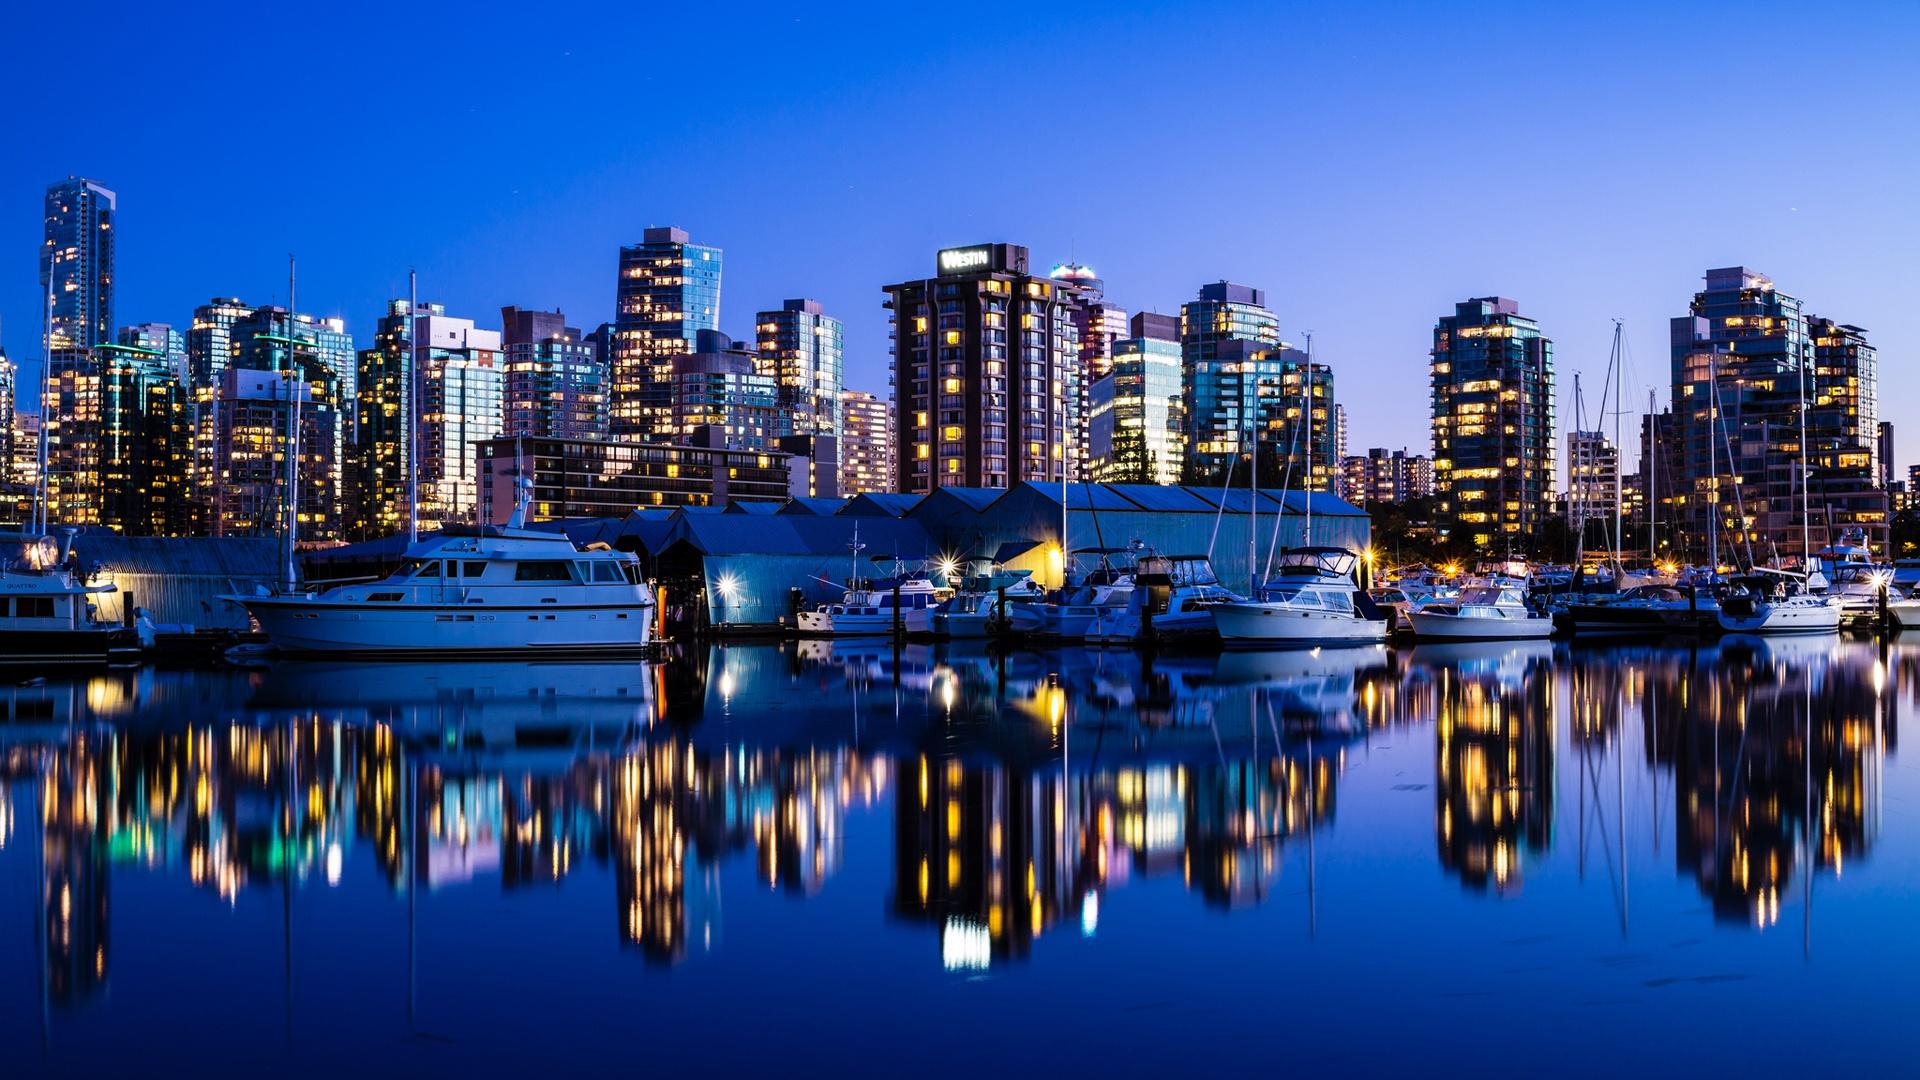 Download Wallpaper 1920x1080 Vancouver Canada City Night